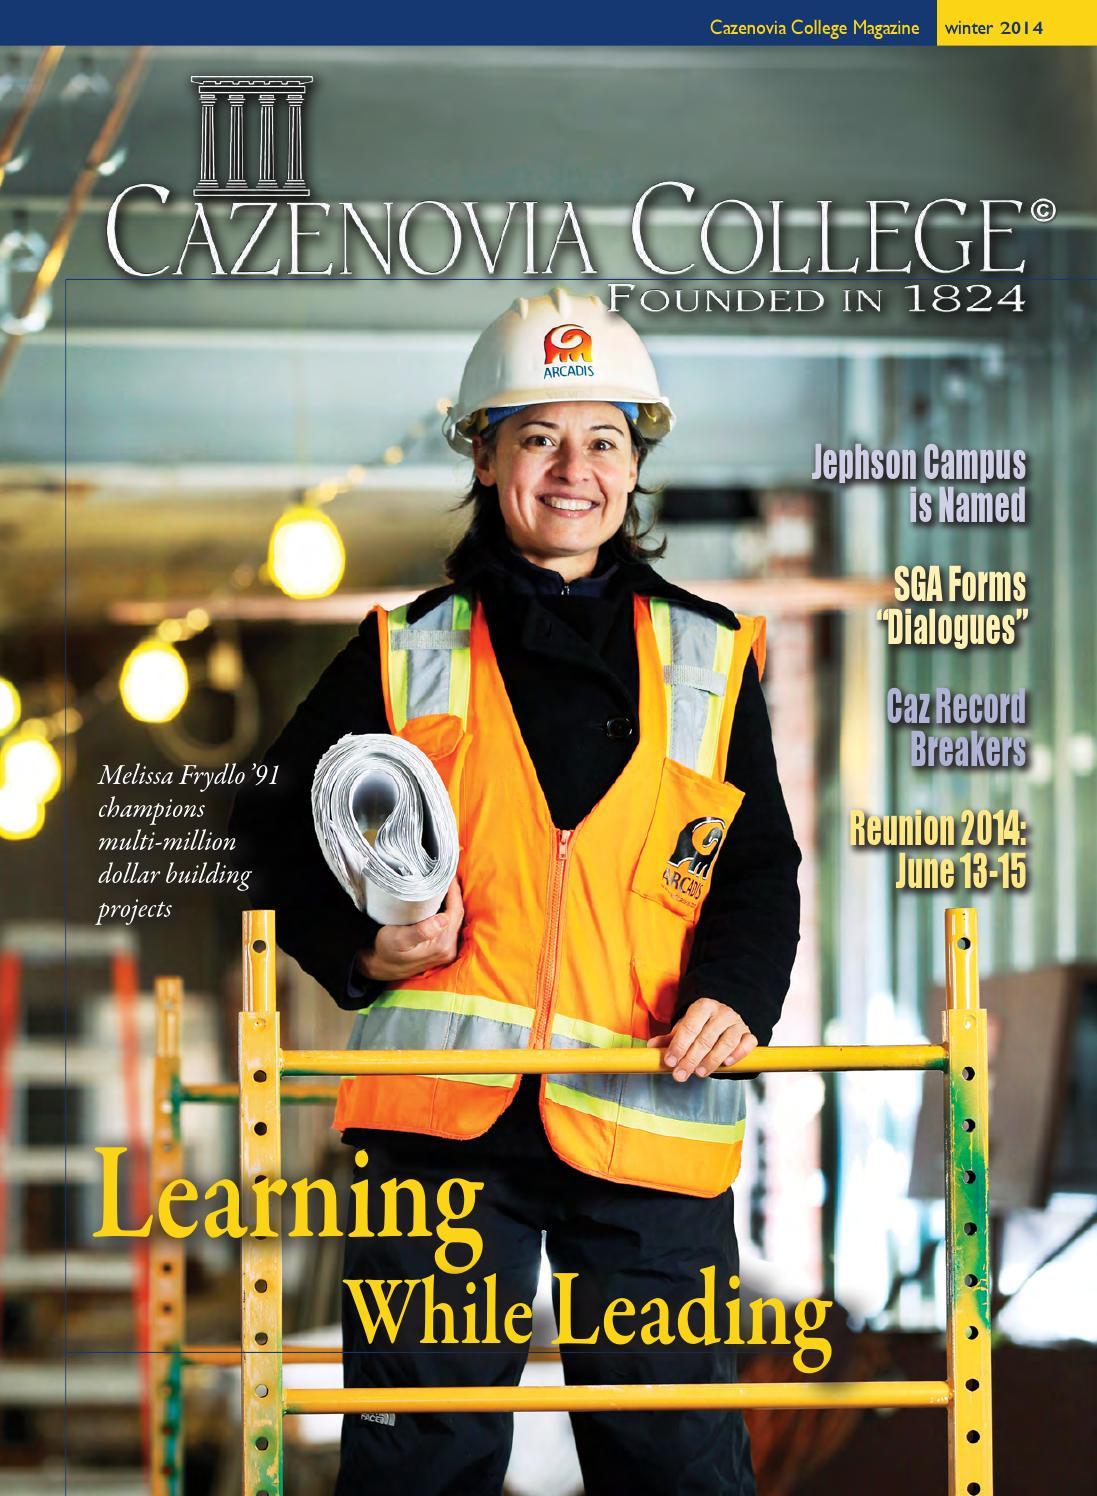 2014 Cazenovia College Winter Magazine by Cazenovia ...